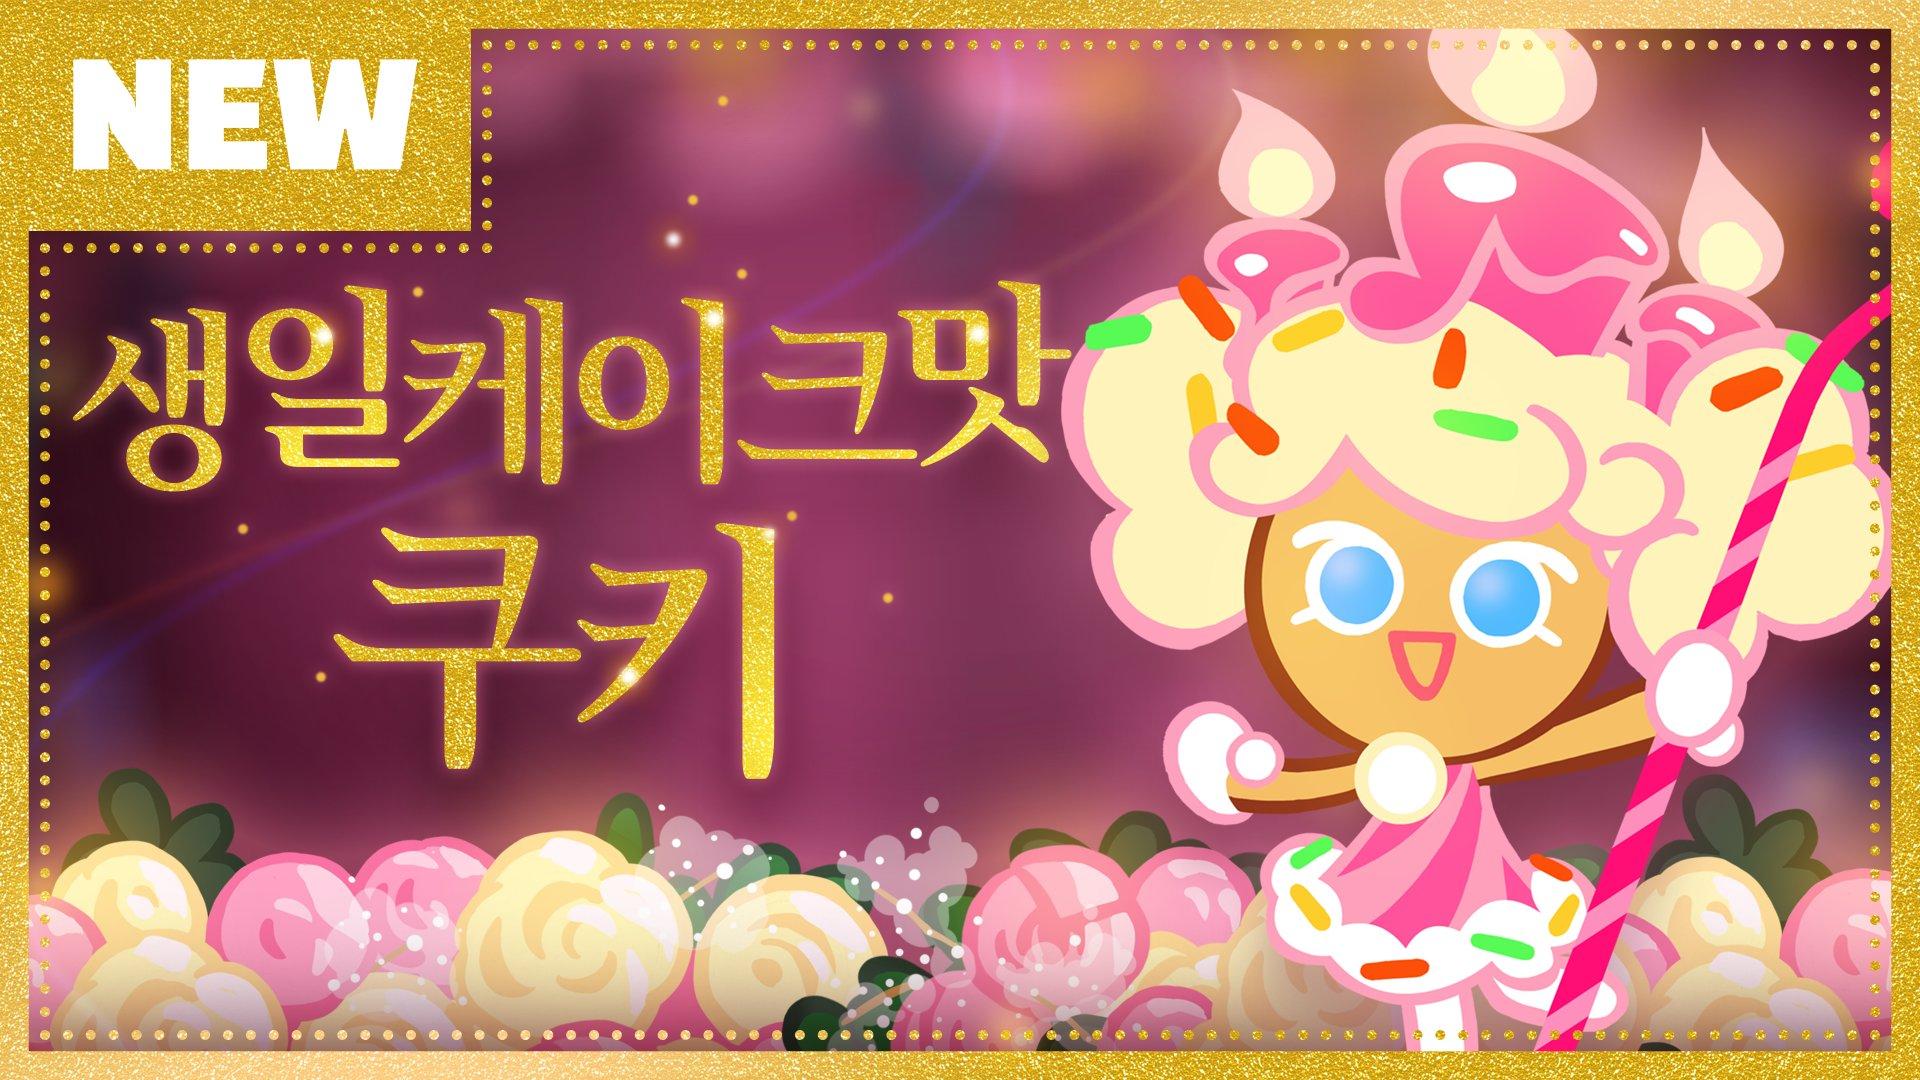 Fabulous Birthday Cake Cookie Cookie Run Ovenbreak Wallpaper 2731421 Funny Birthday Cards Online Necthendildamsfinfo